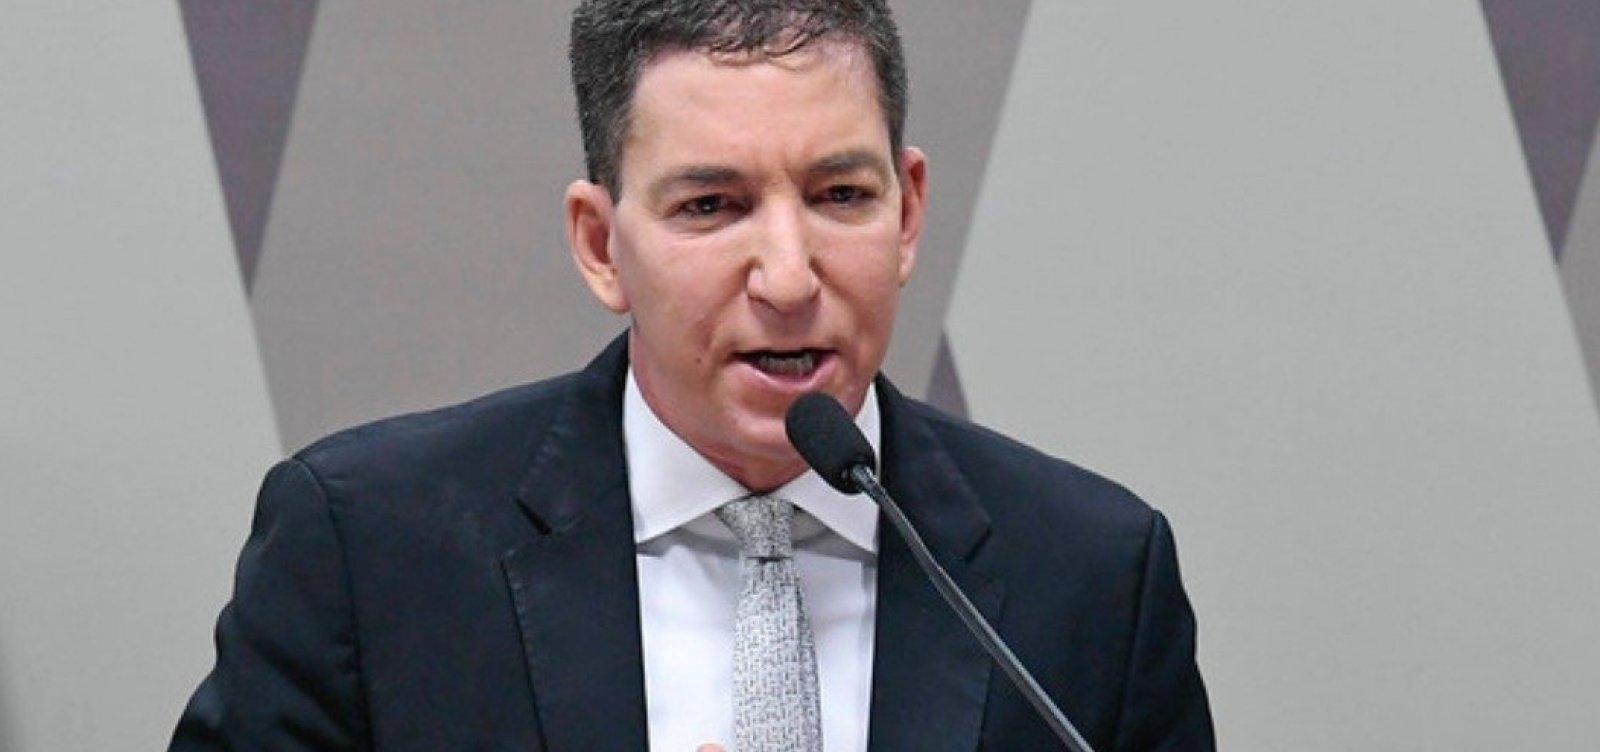 [PF prepara prisão contra 'Vaza Jato', diz Gleen Greenwald]